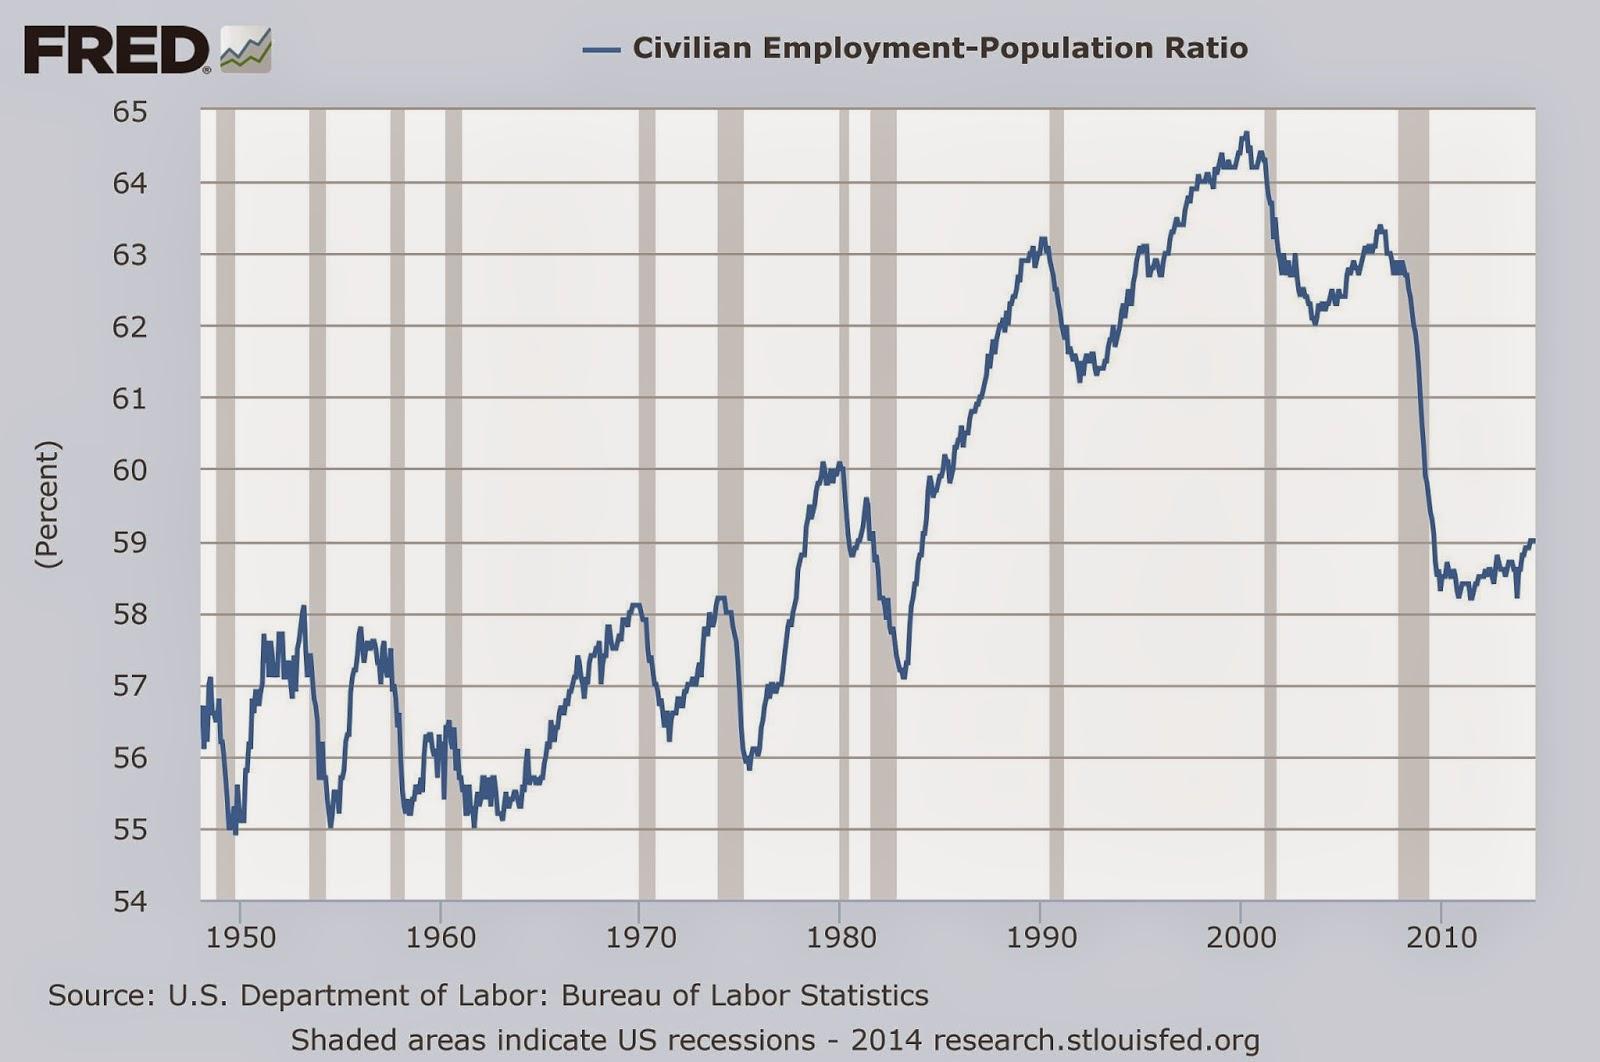 NAKED KEYNESIANISM: Unemployment is involuntary, not